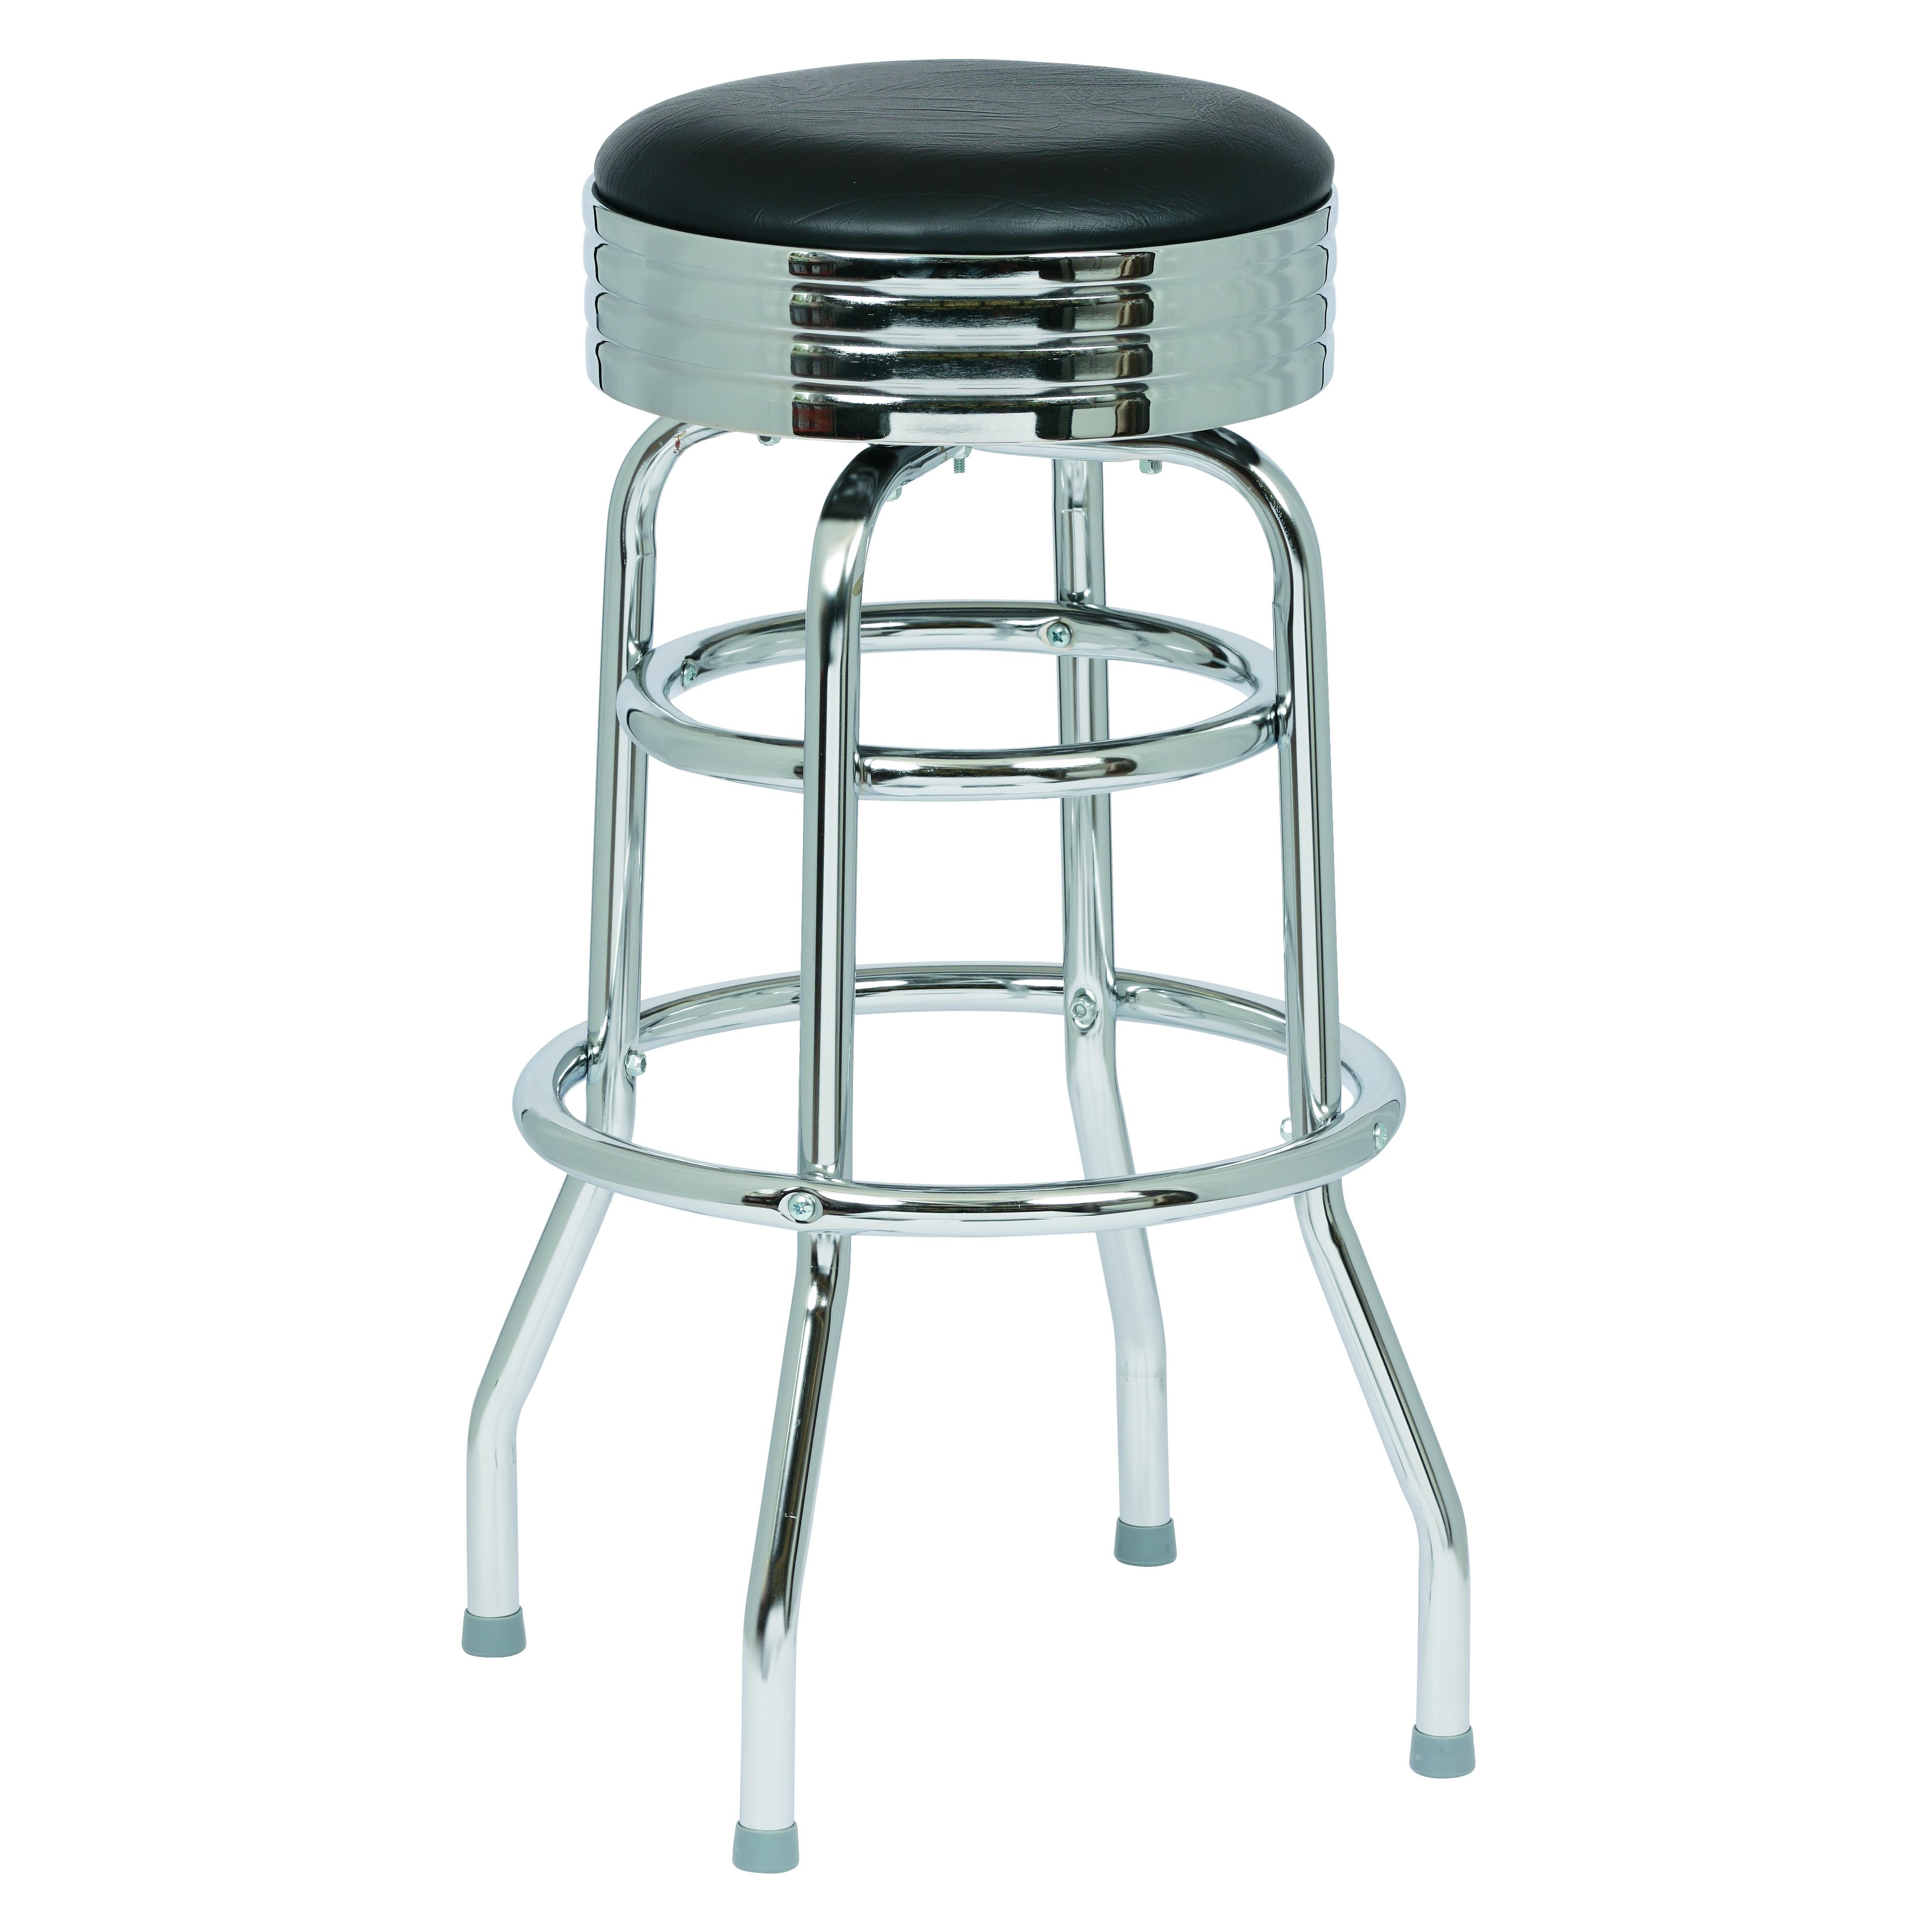 Royal Industries ROY 7710 B bar stool, swivel, indoor